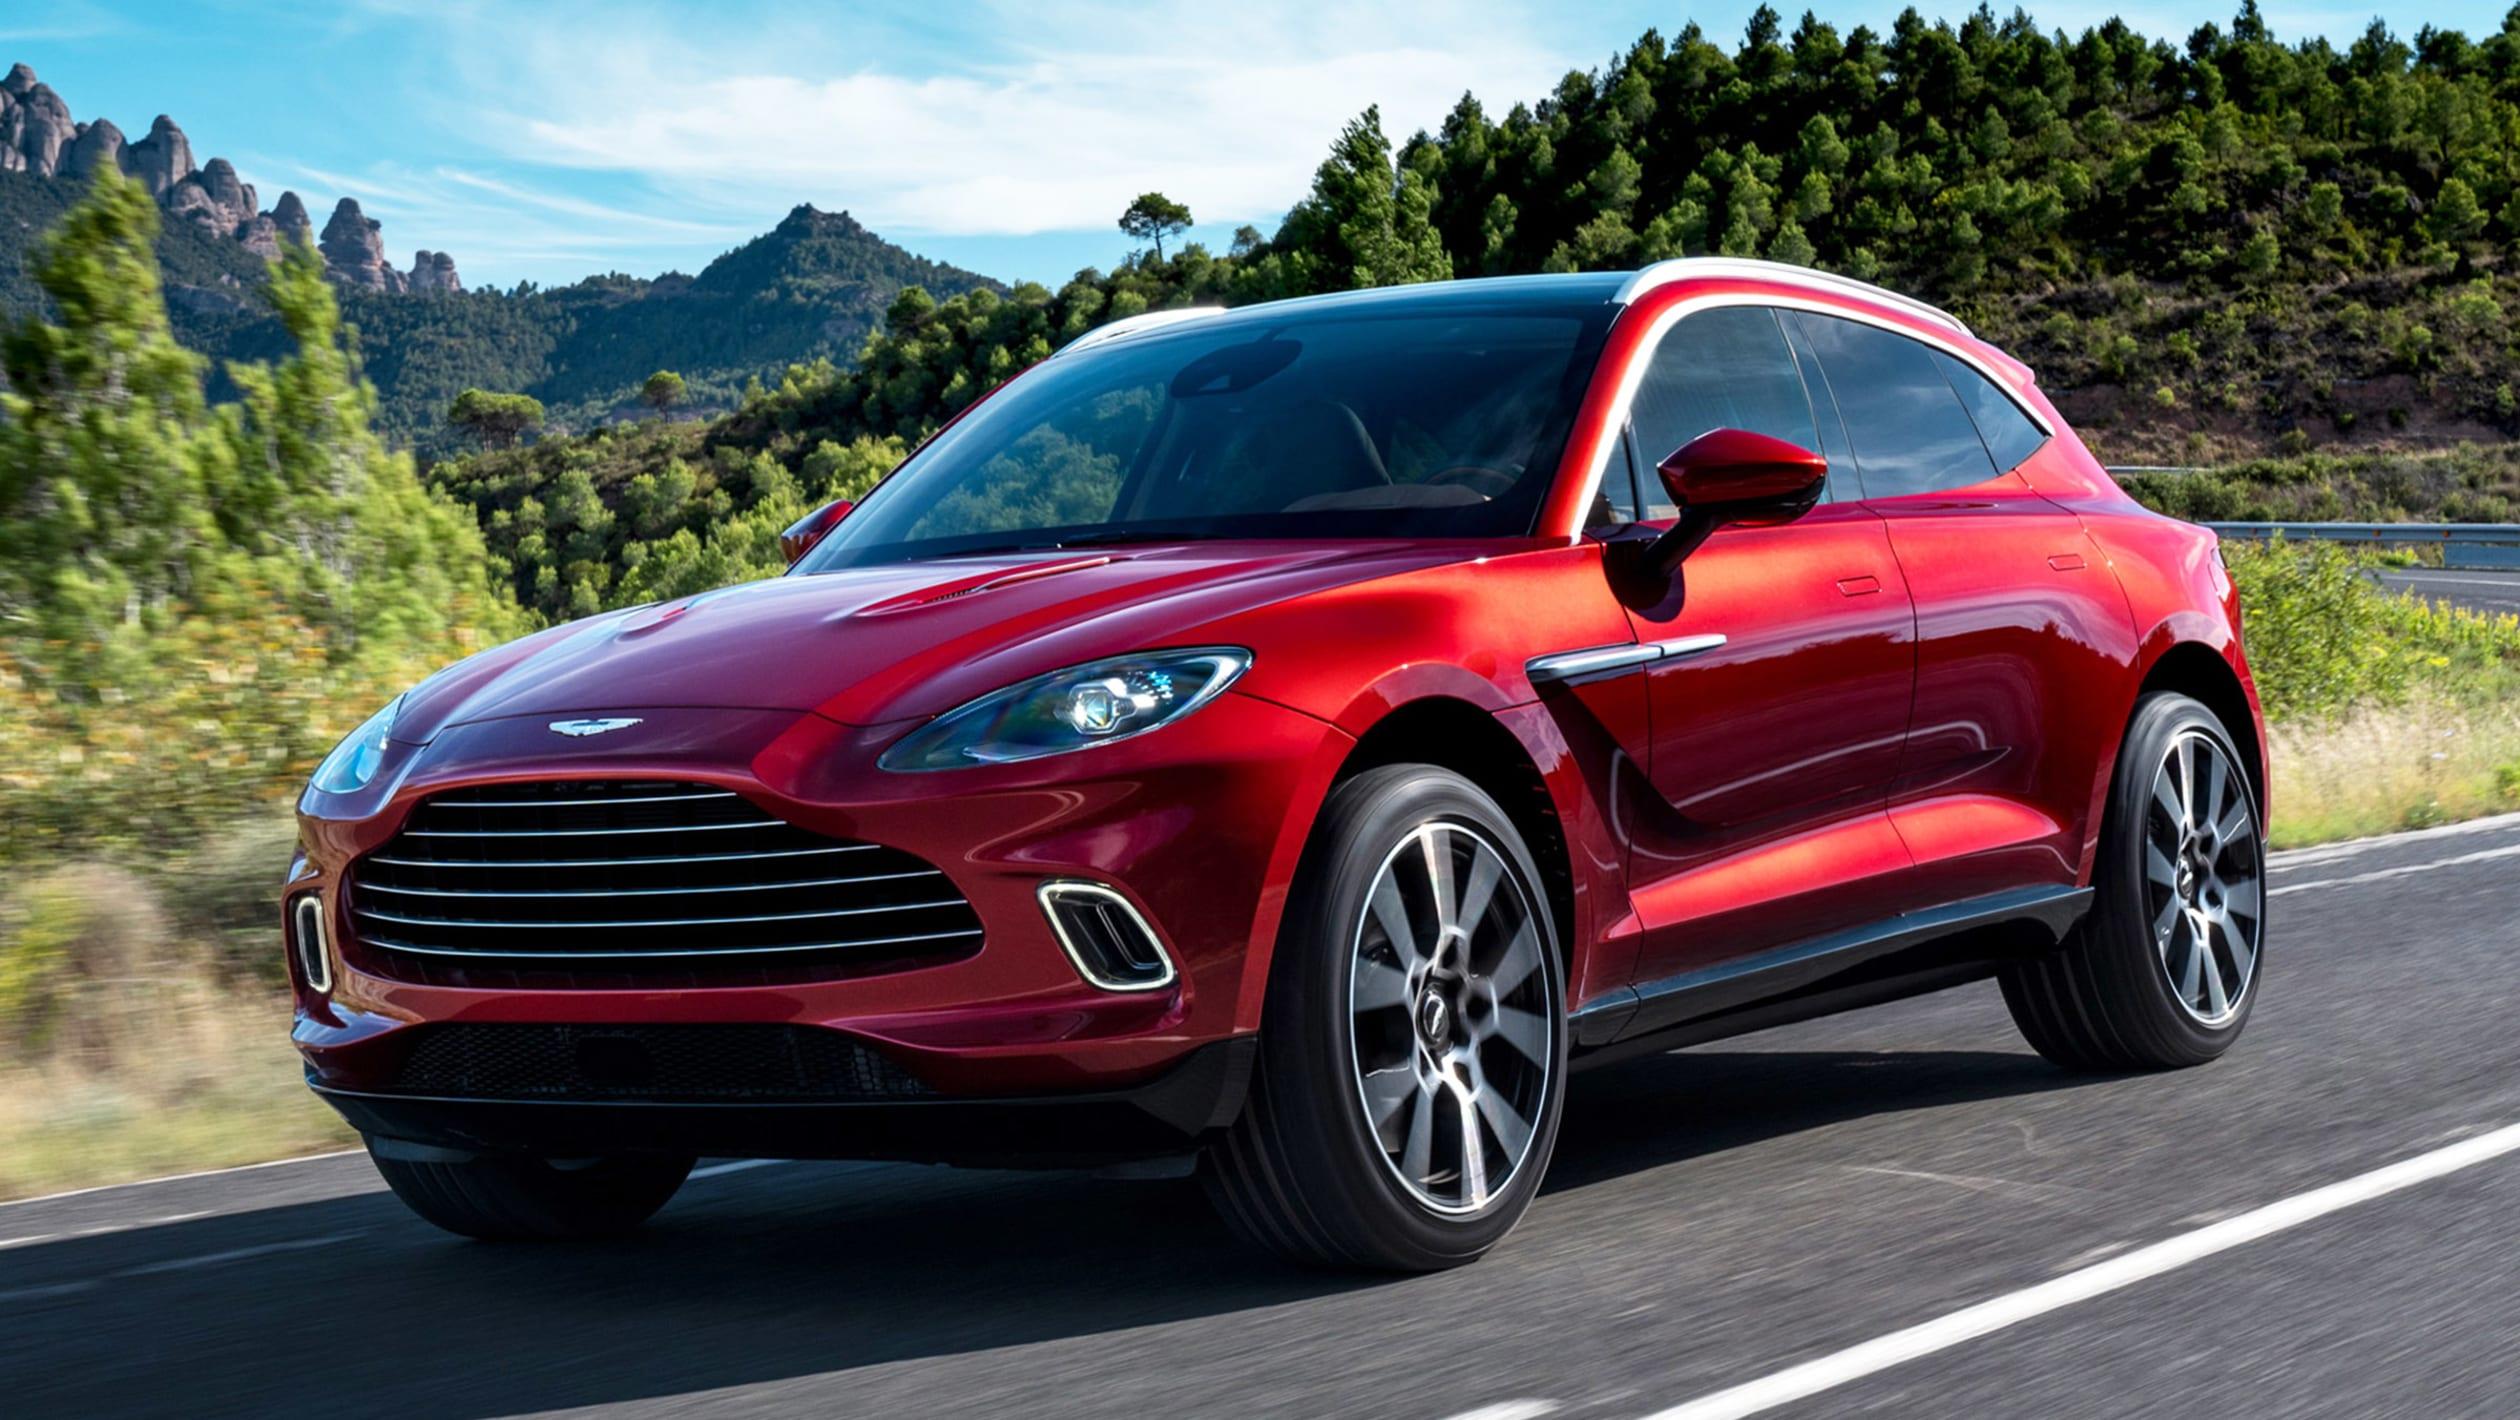 Aston Martin Dbx Model Range To Grow From 2021 Auto Express